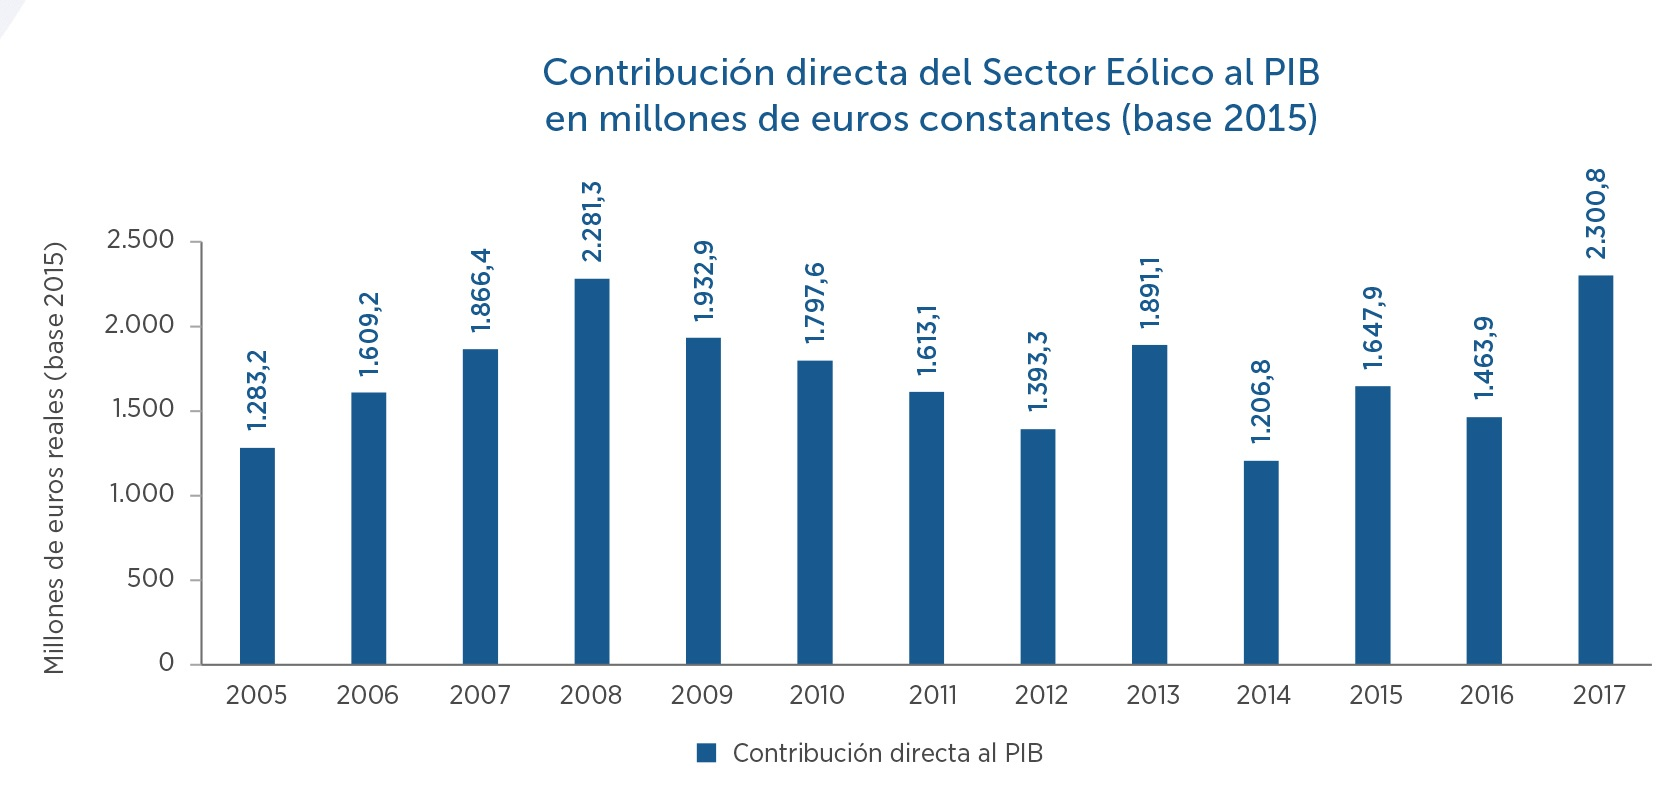 4-Contribucin-directa-sector-eolico-al-PIB